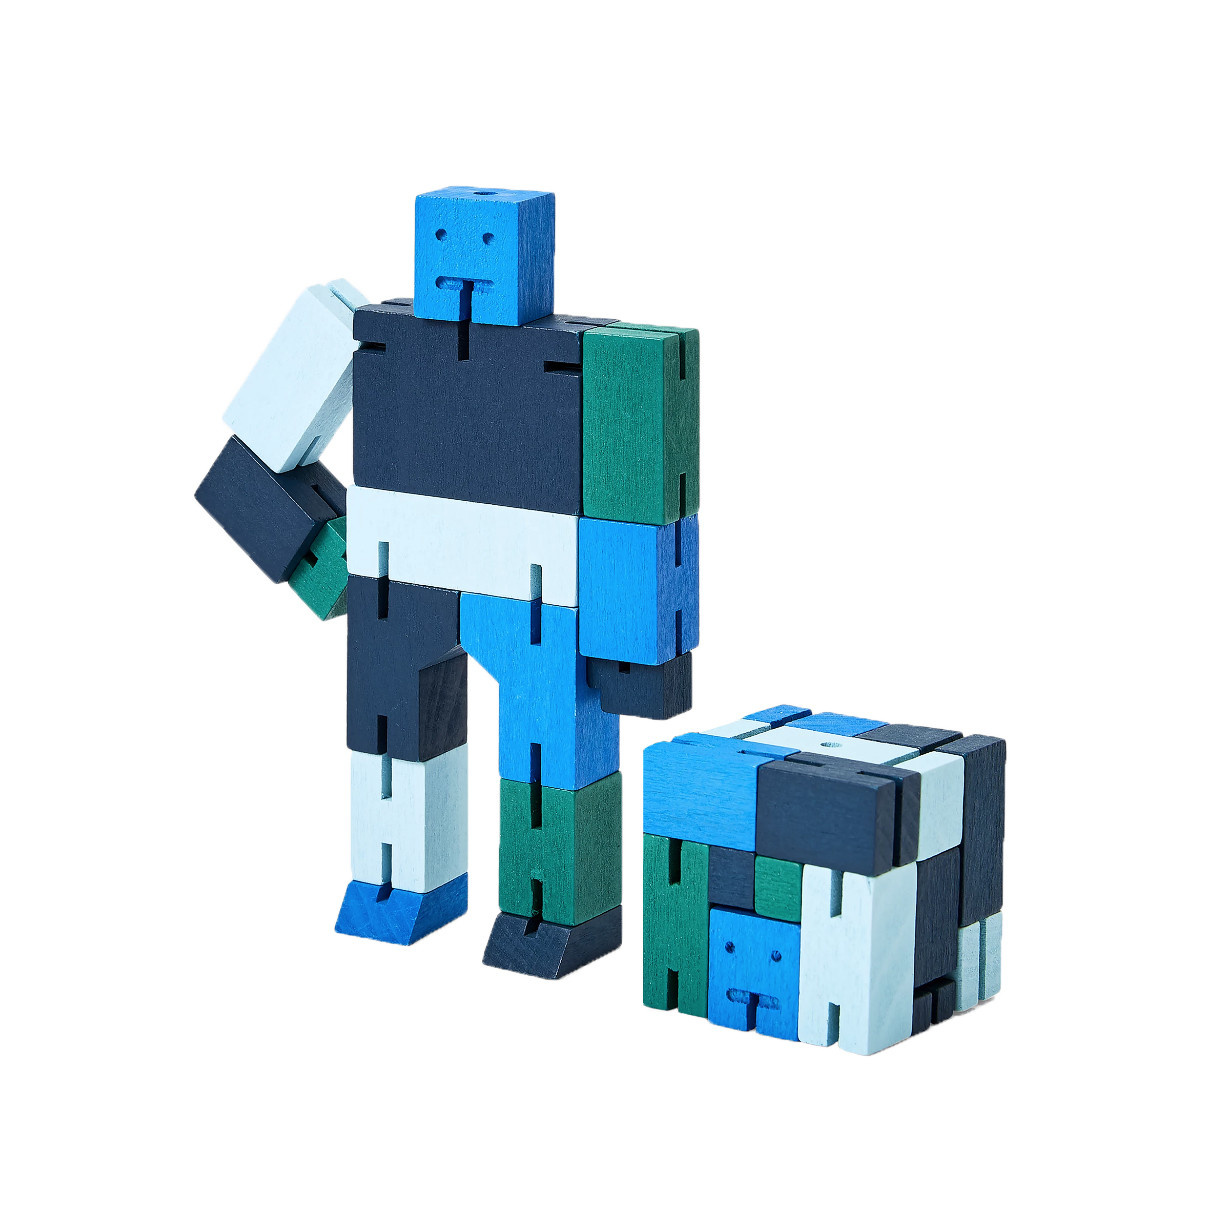 Cubebot Capsule Micro - Blue Multi